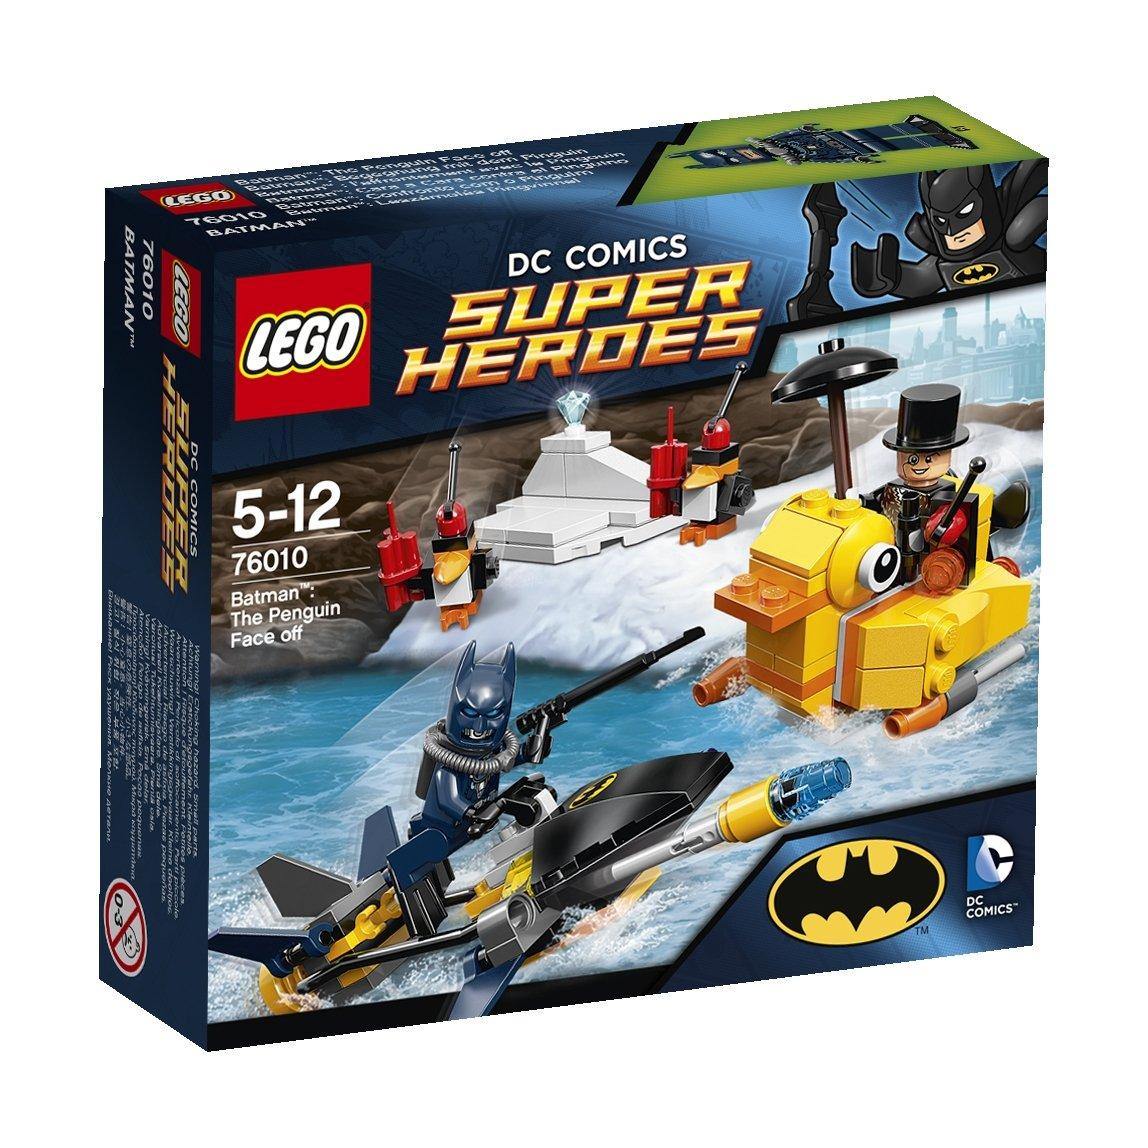 LEGO 76010 - DC Universe Super Heroes